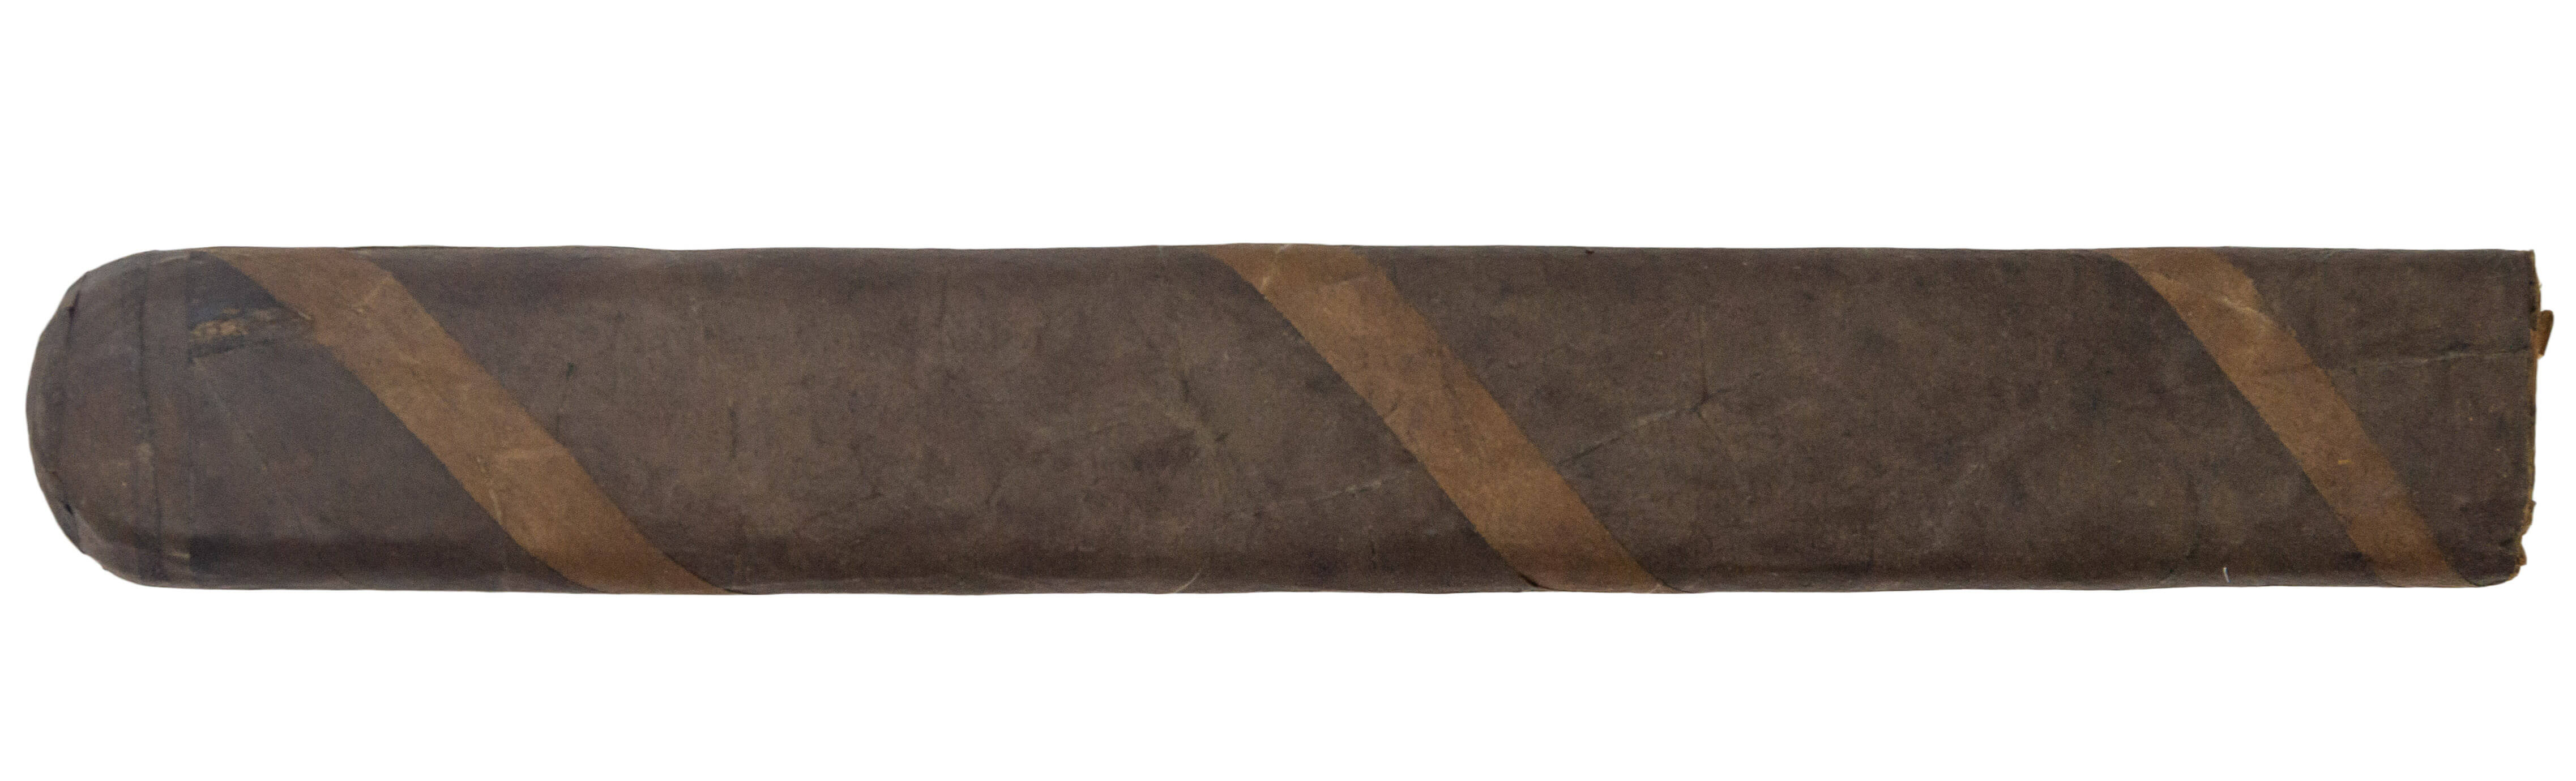 Cigar News: Dissident Ships HOME 2021